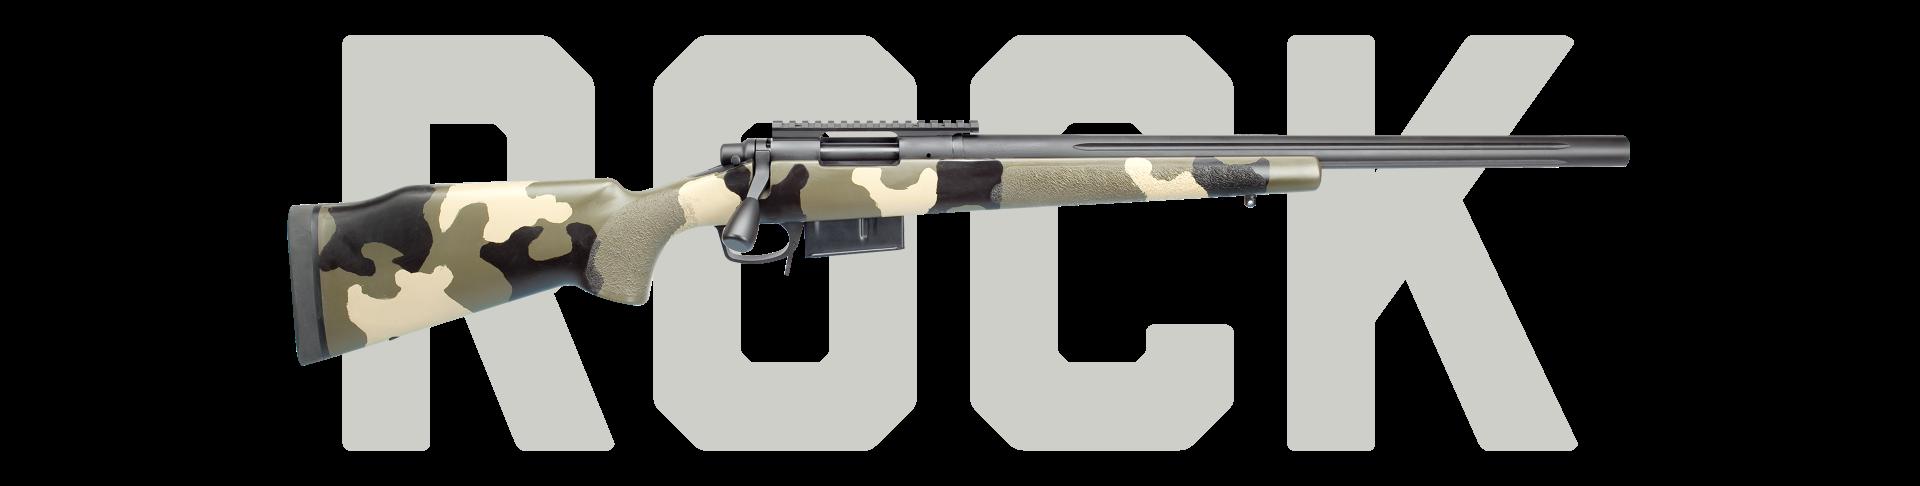 vector download G a precision professional. Vector carbine 50 cal